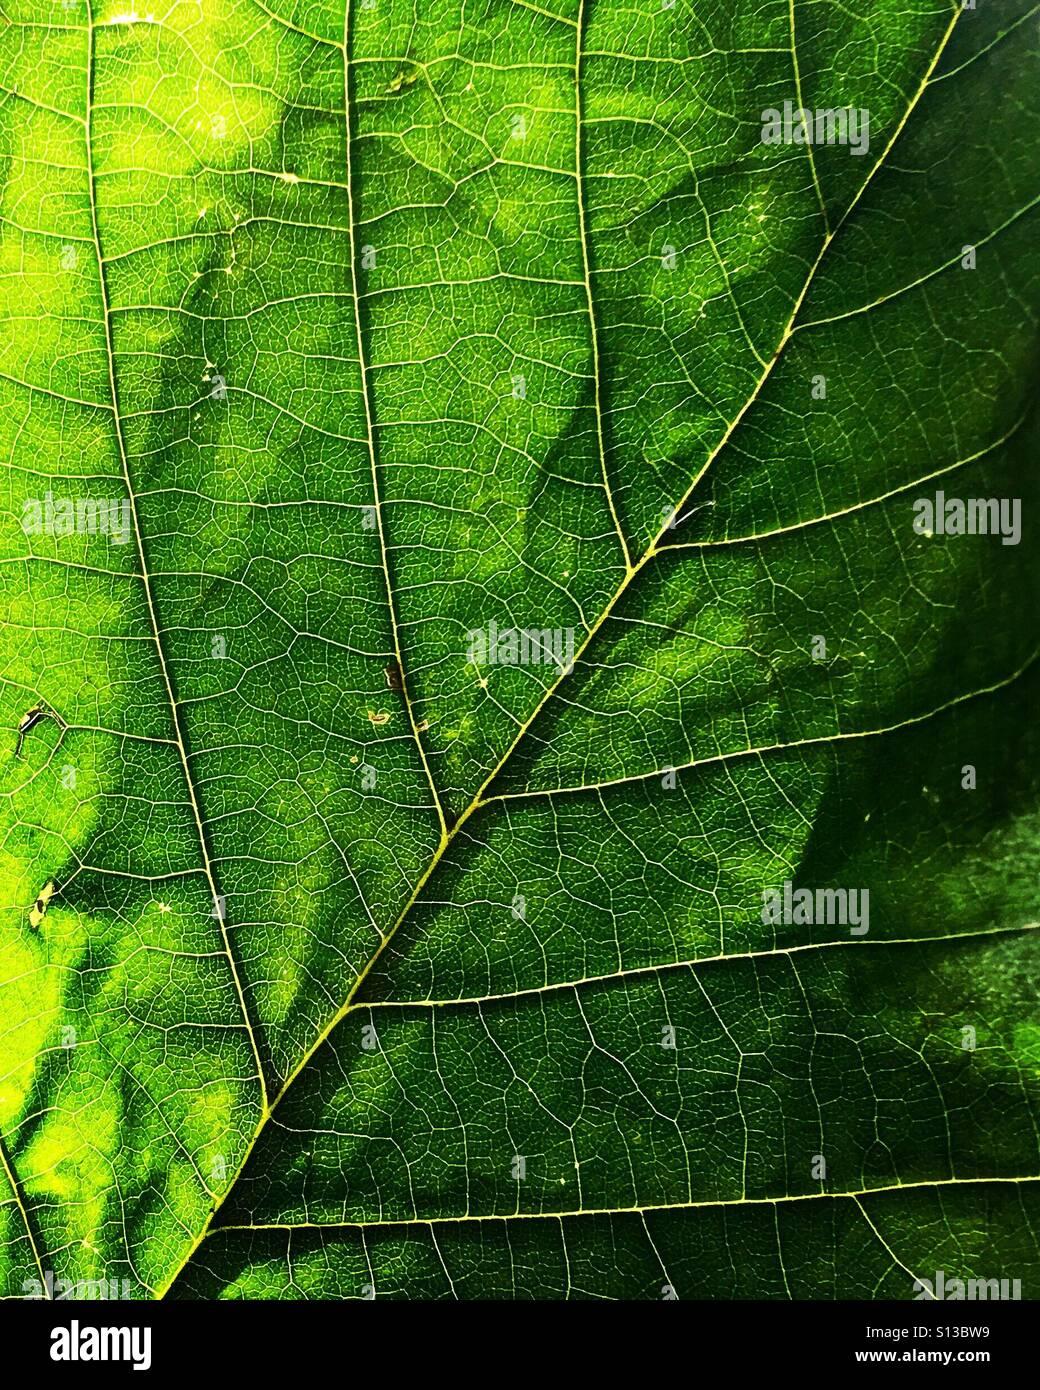 Nahaufnahme von einem grünen Blatt. Stockbild